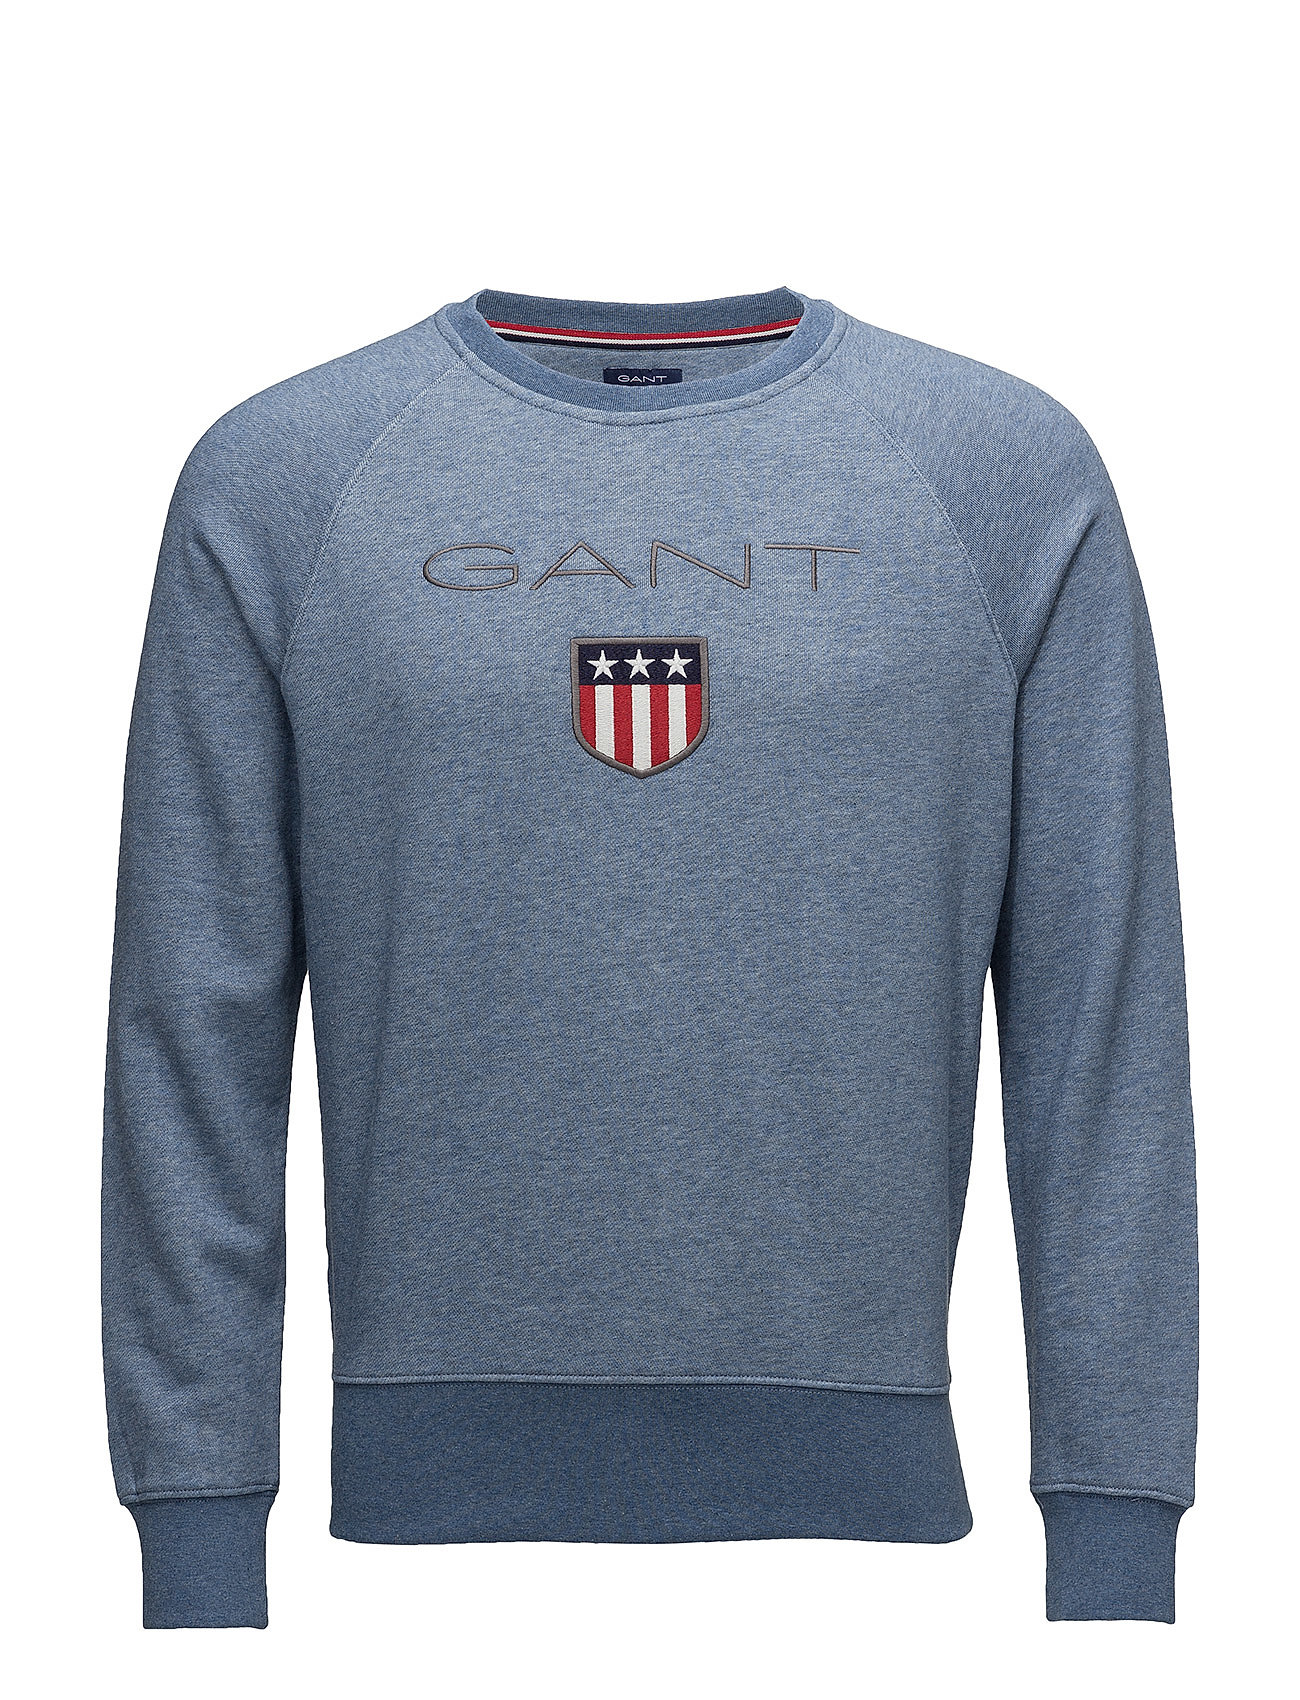 GANT GANT SHIELD C-NECK SWEAT